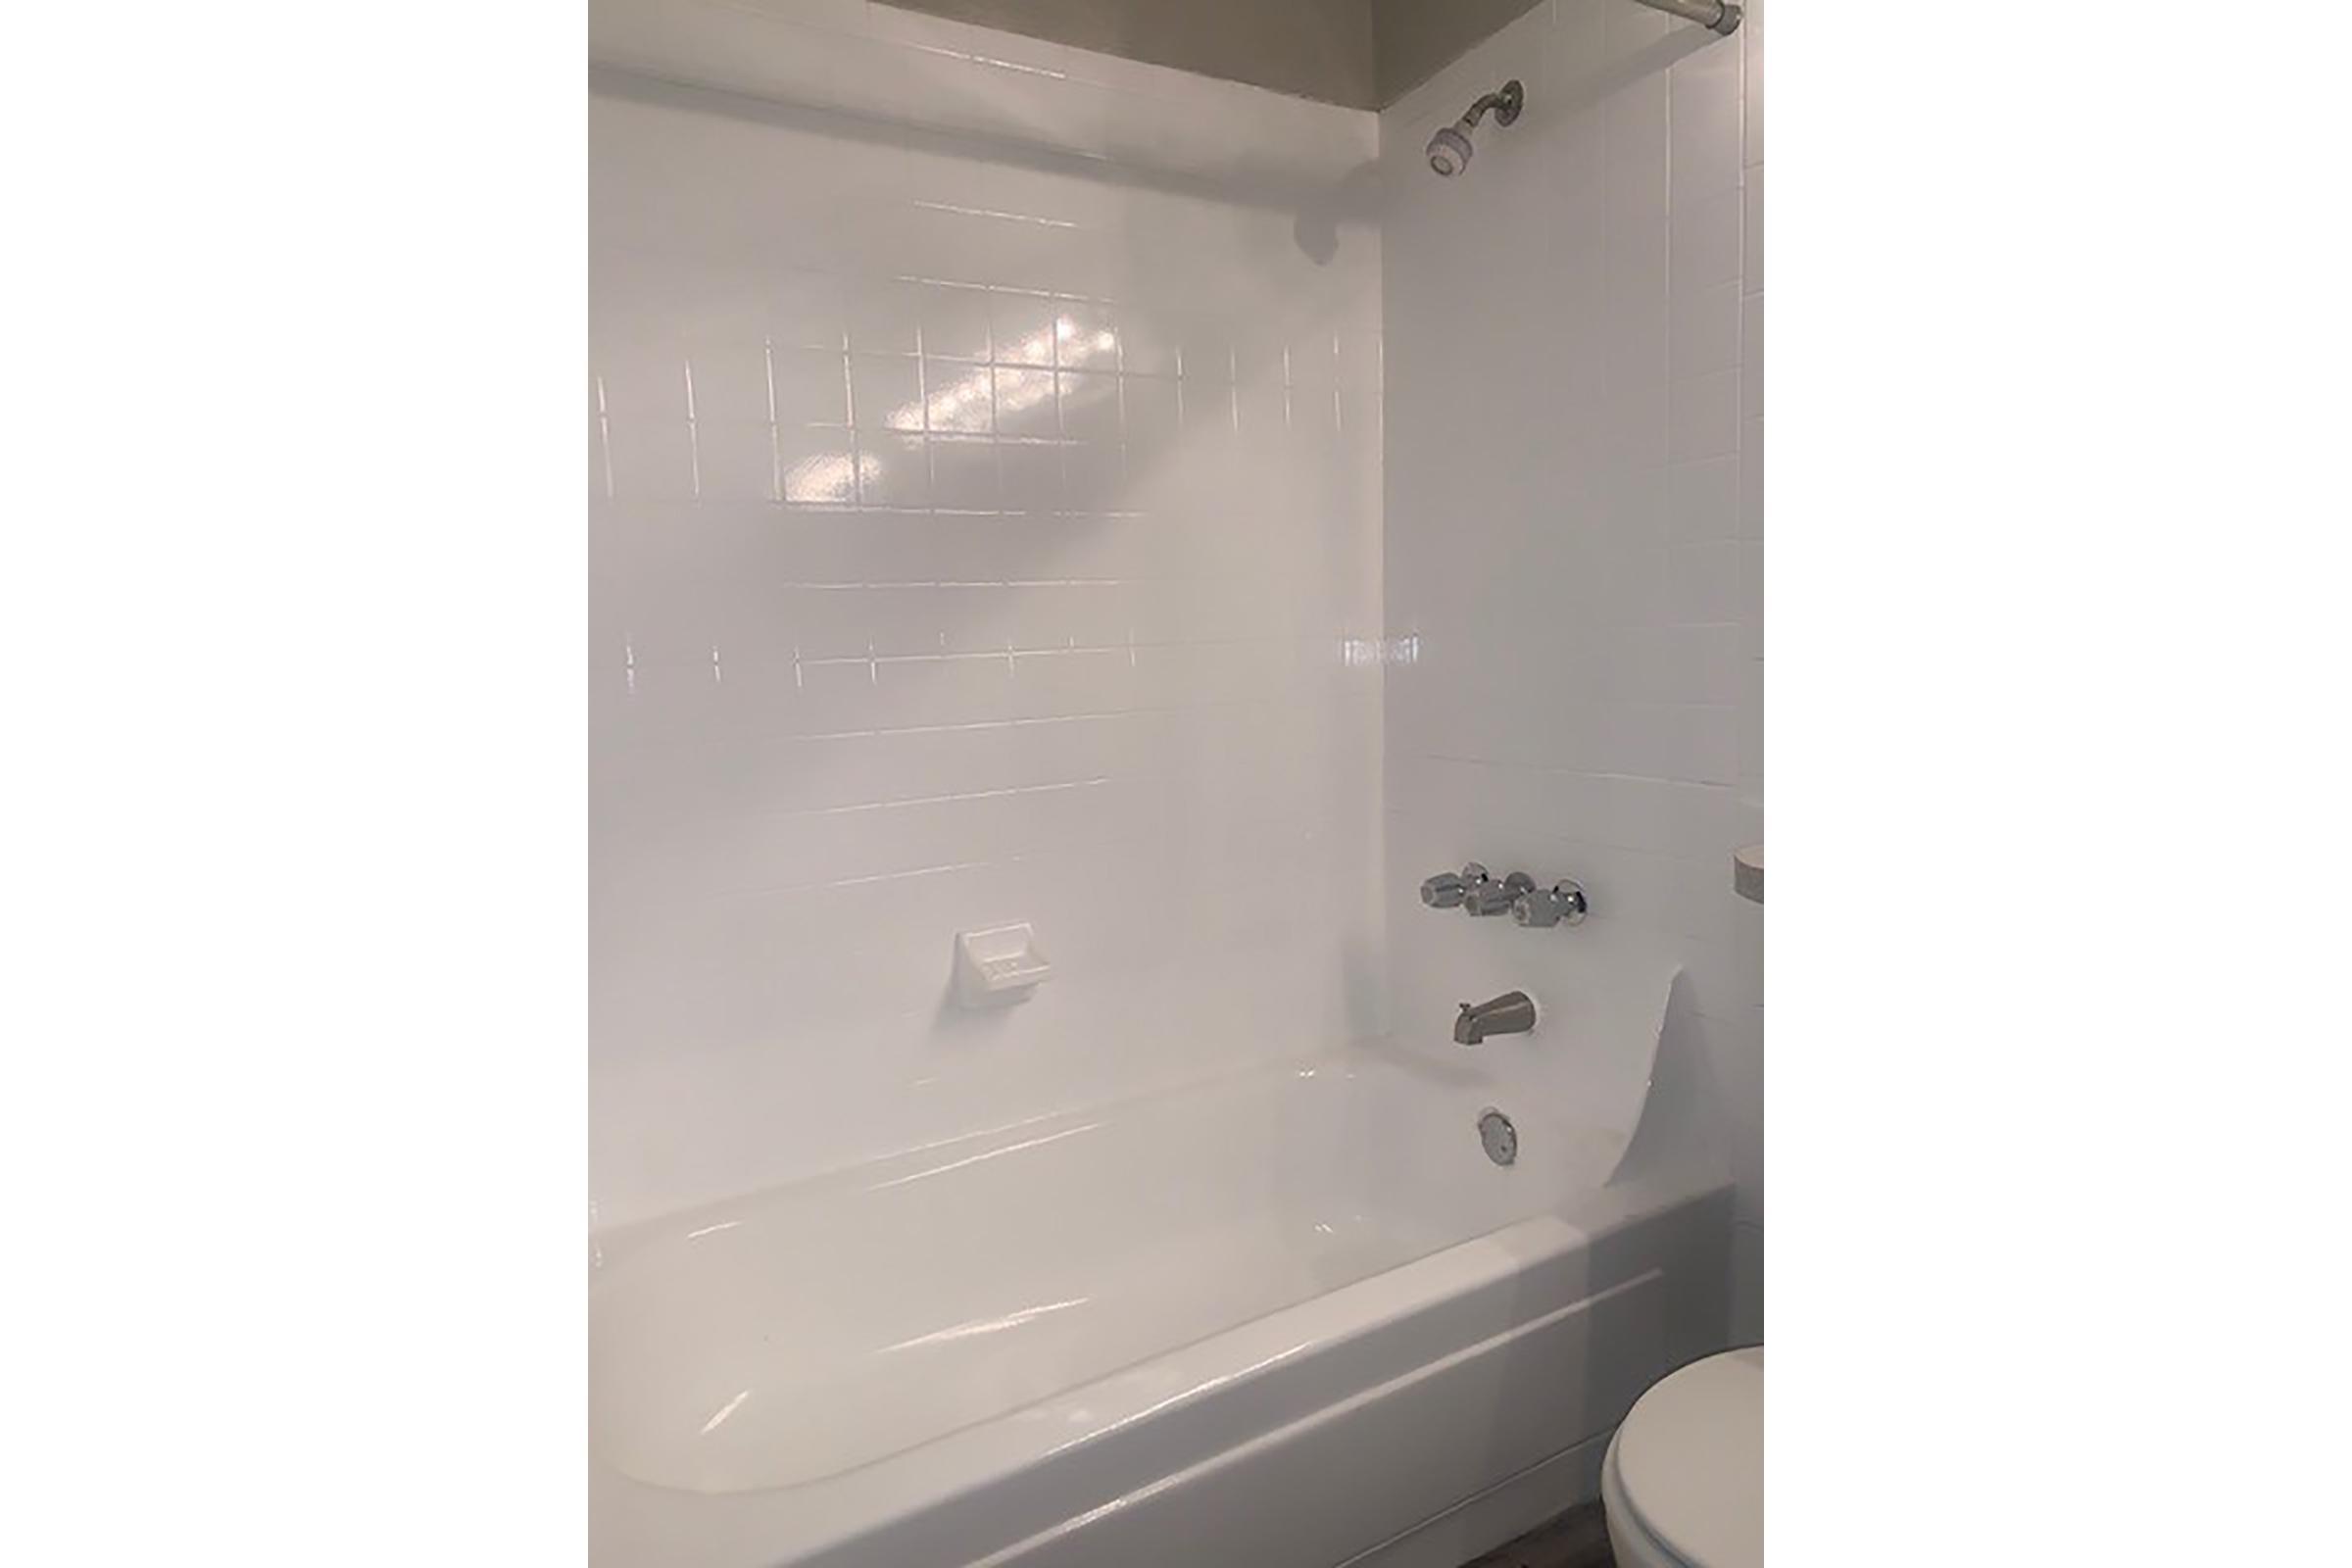 a white tub sitting next to a wall